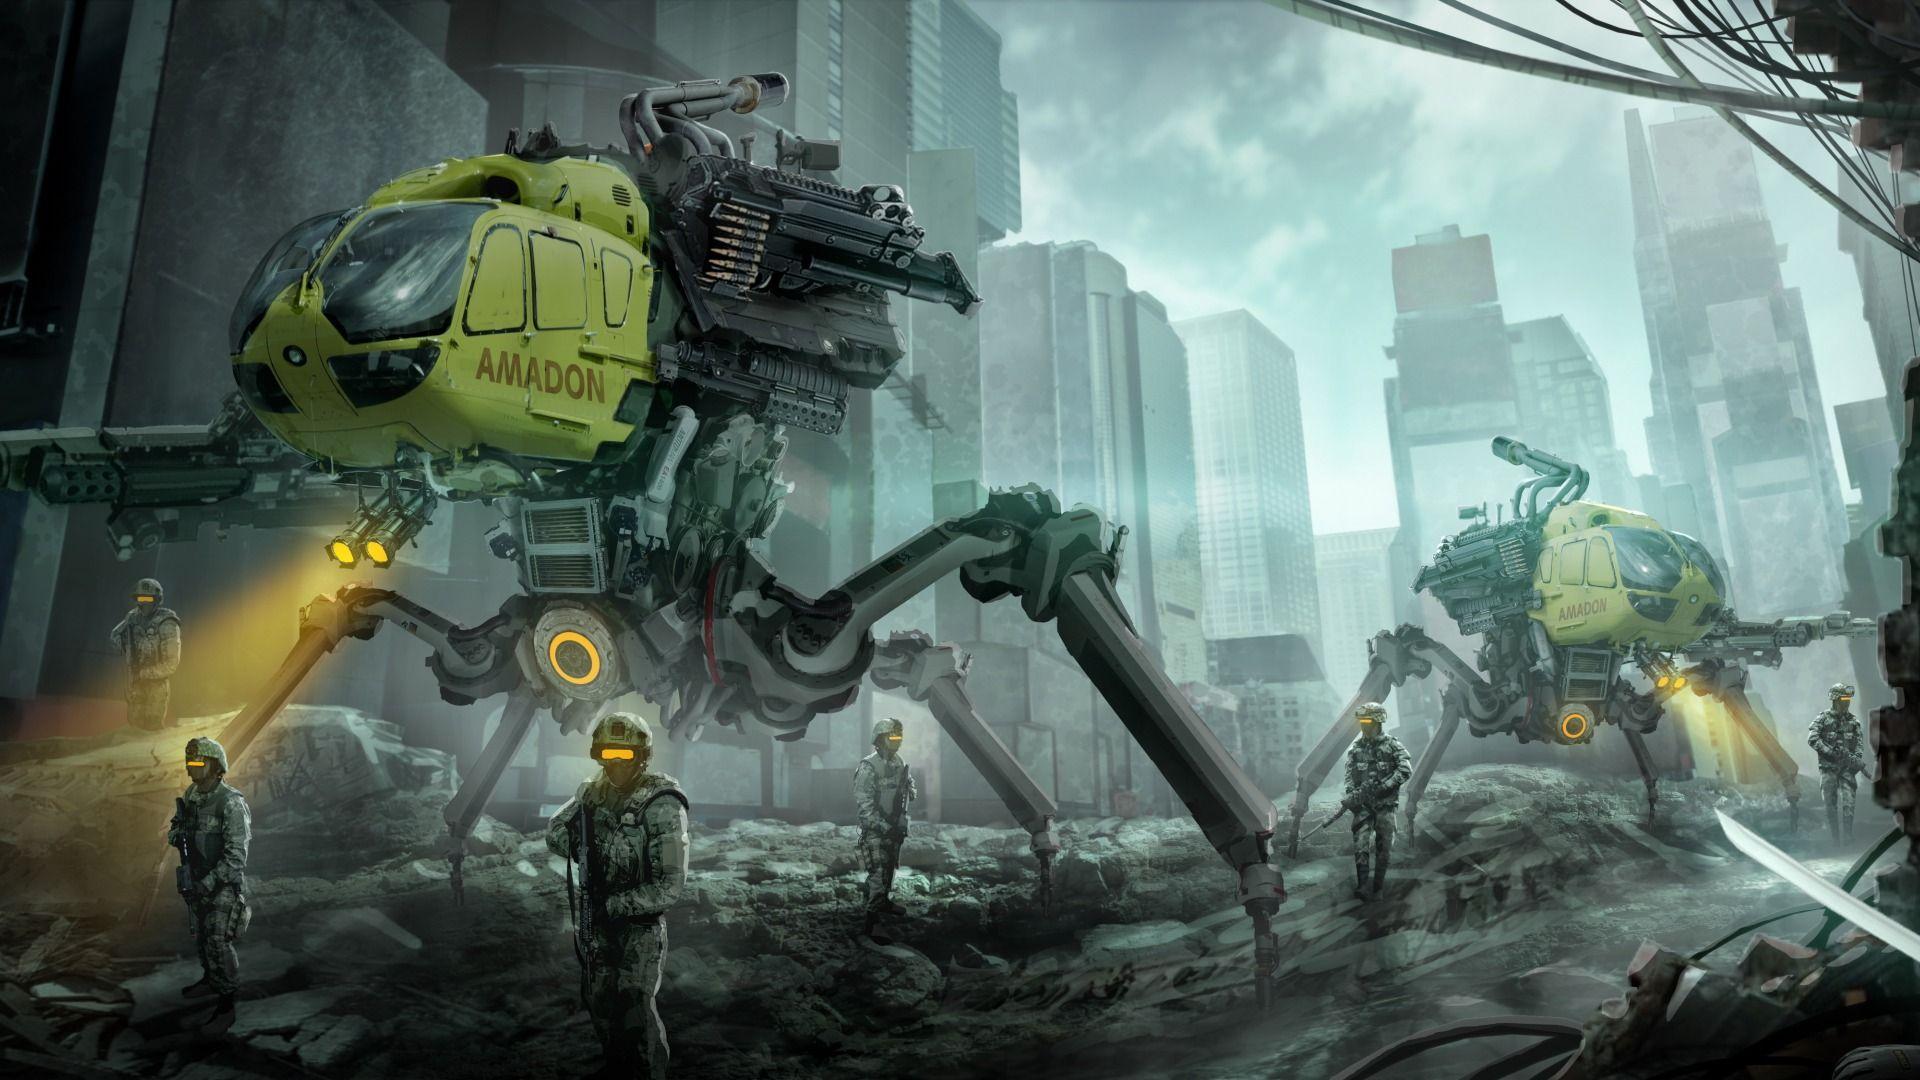 Download Wallpaper The City Soldiers Destruction Art Fantasy Fantasy Resolution 1920x1080 Sci Fi Art Sci Fi Wallpaper Art